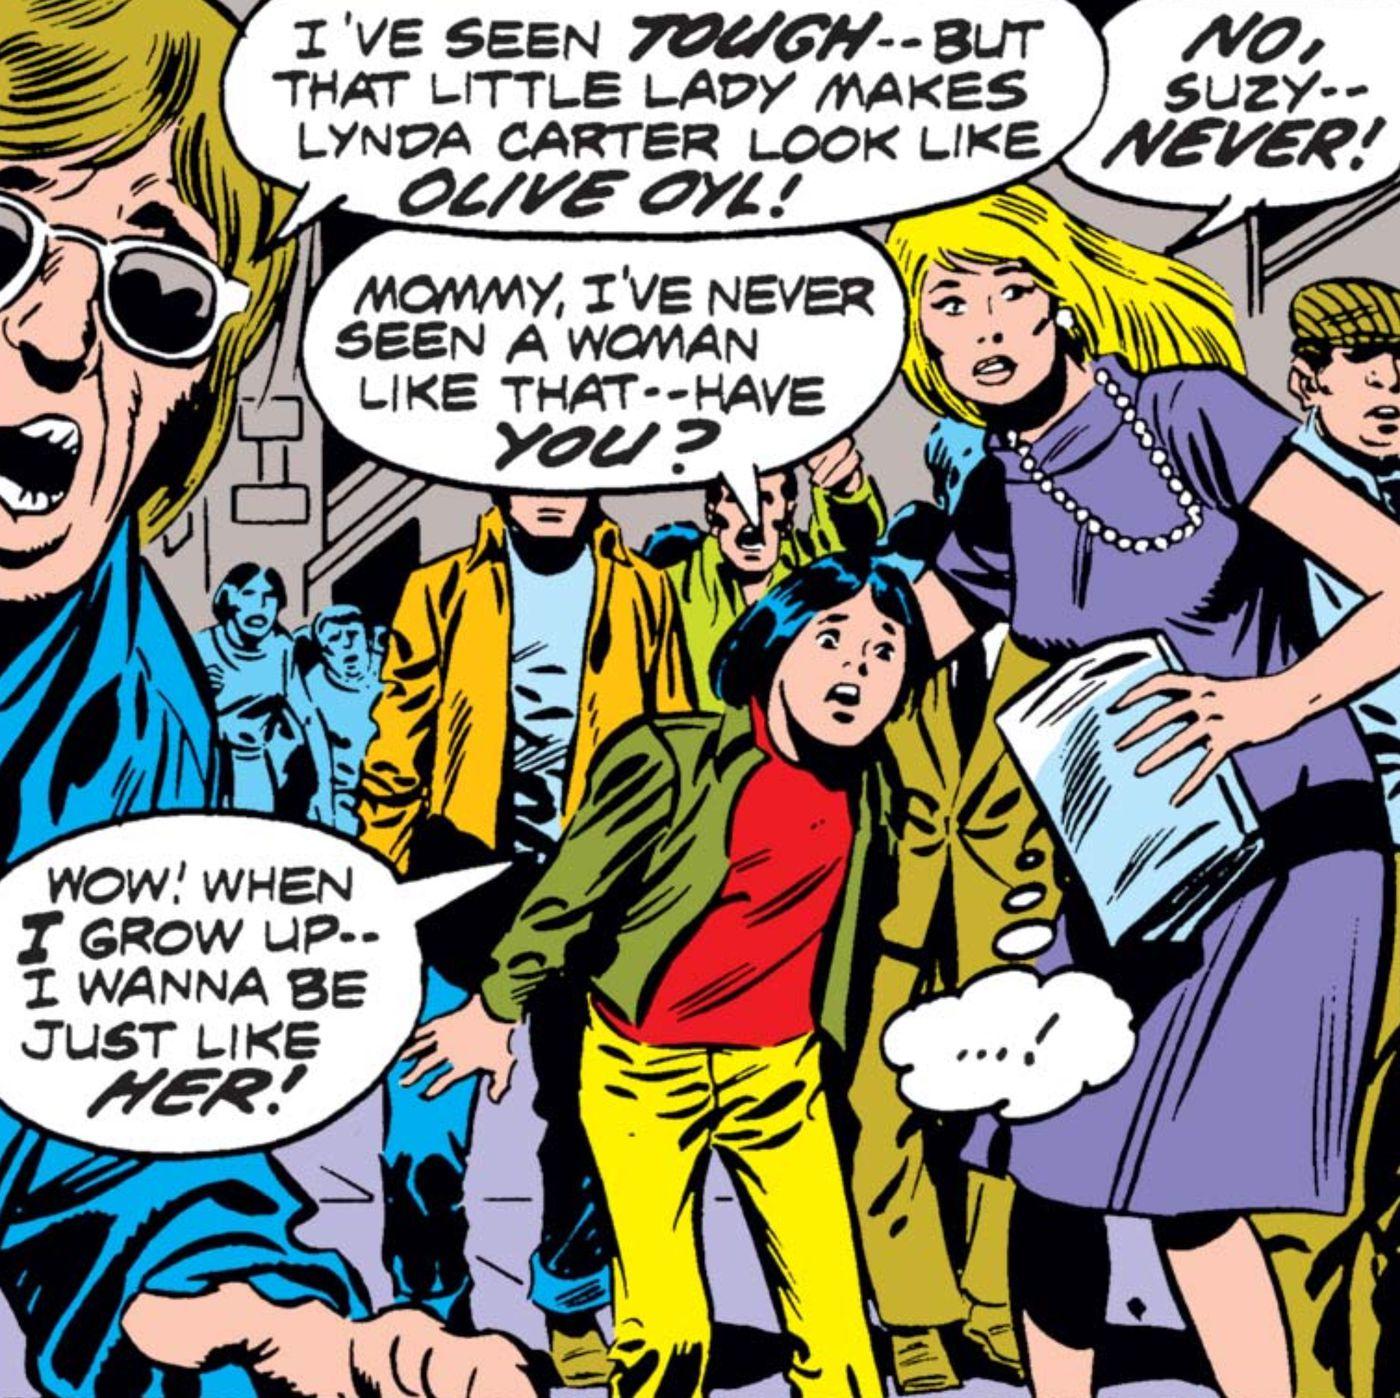 Captain Marvel's origin, powers, and comic history